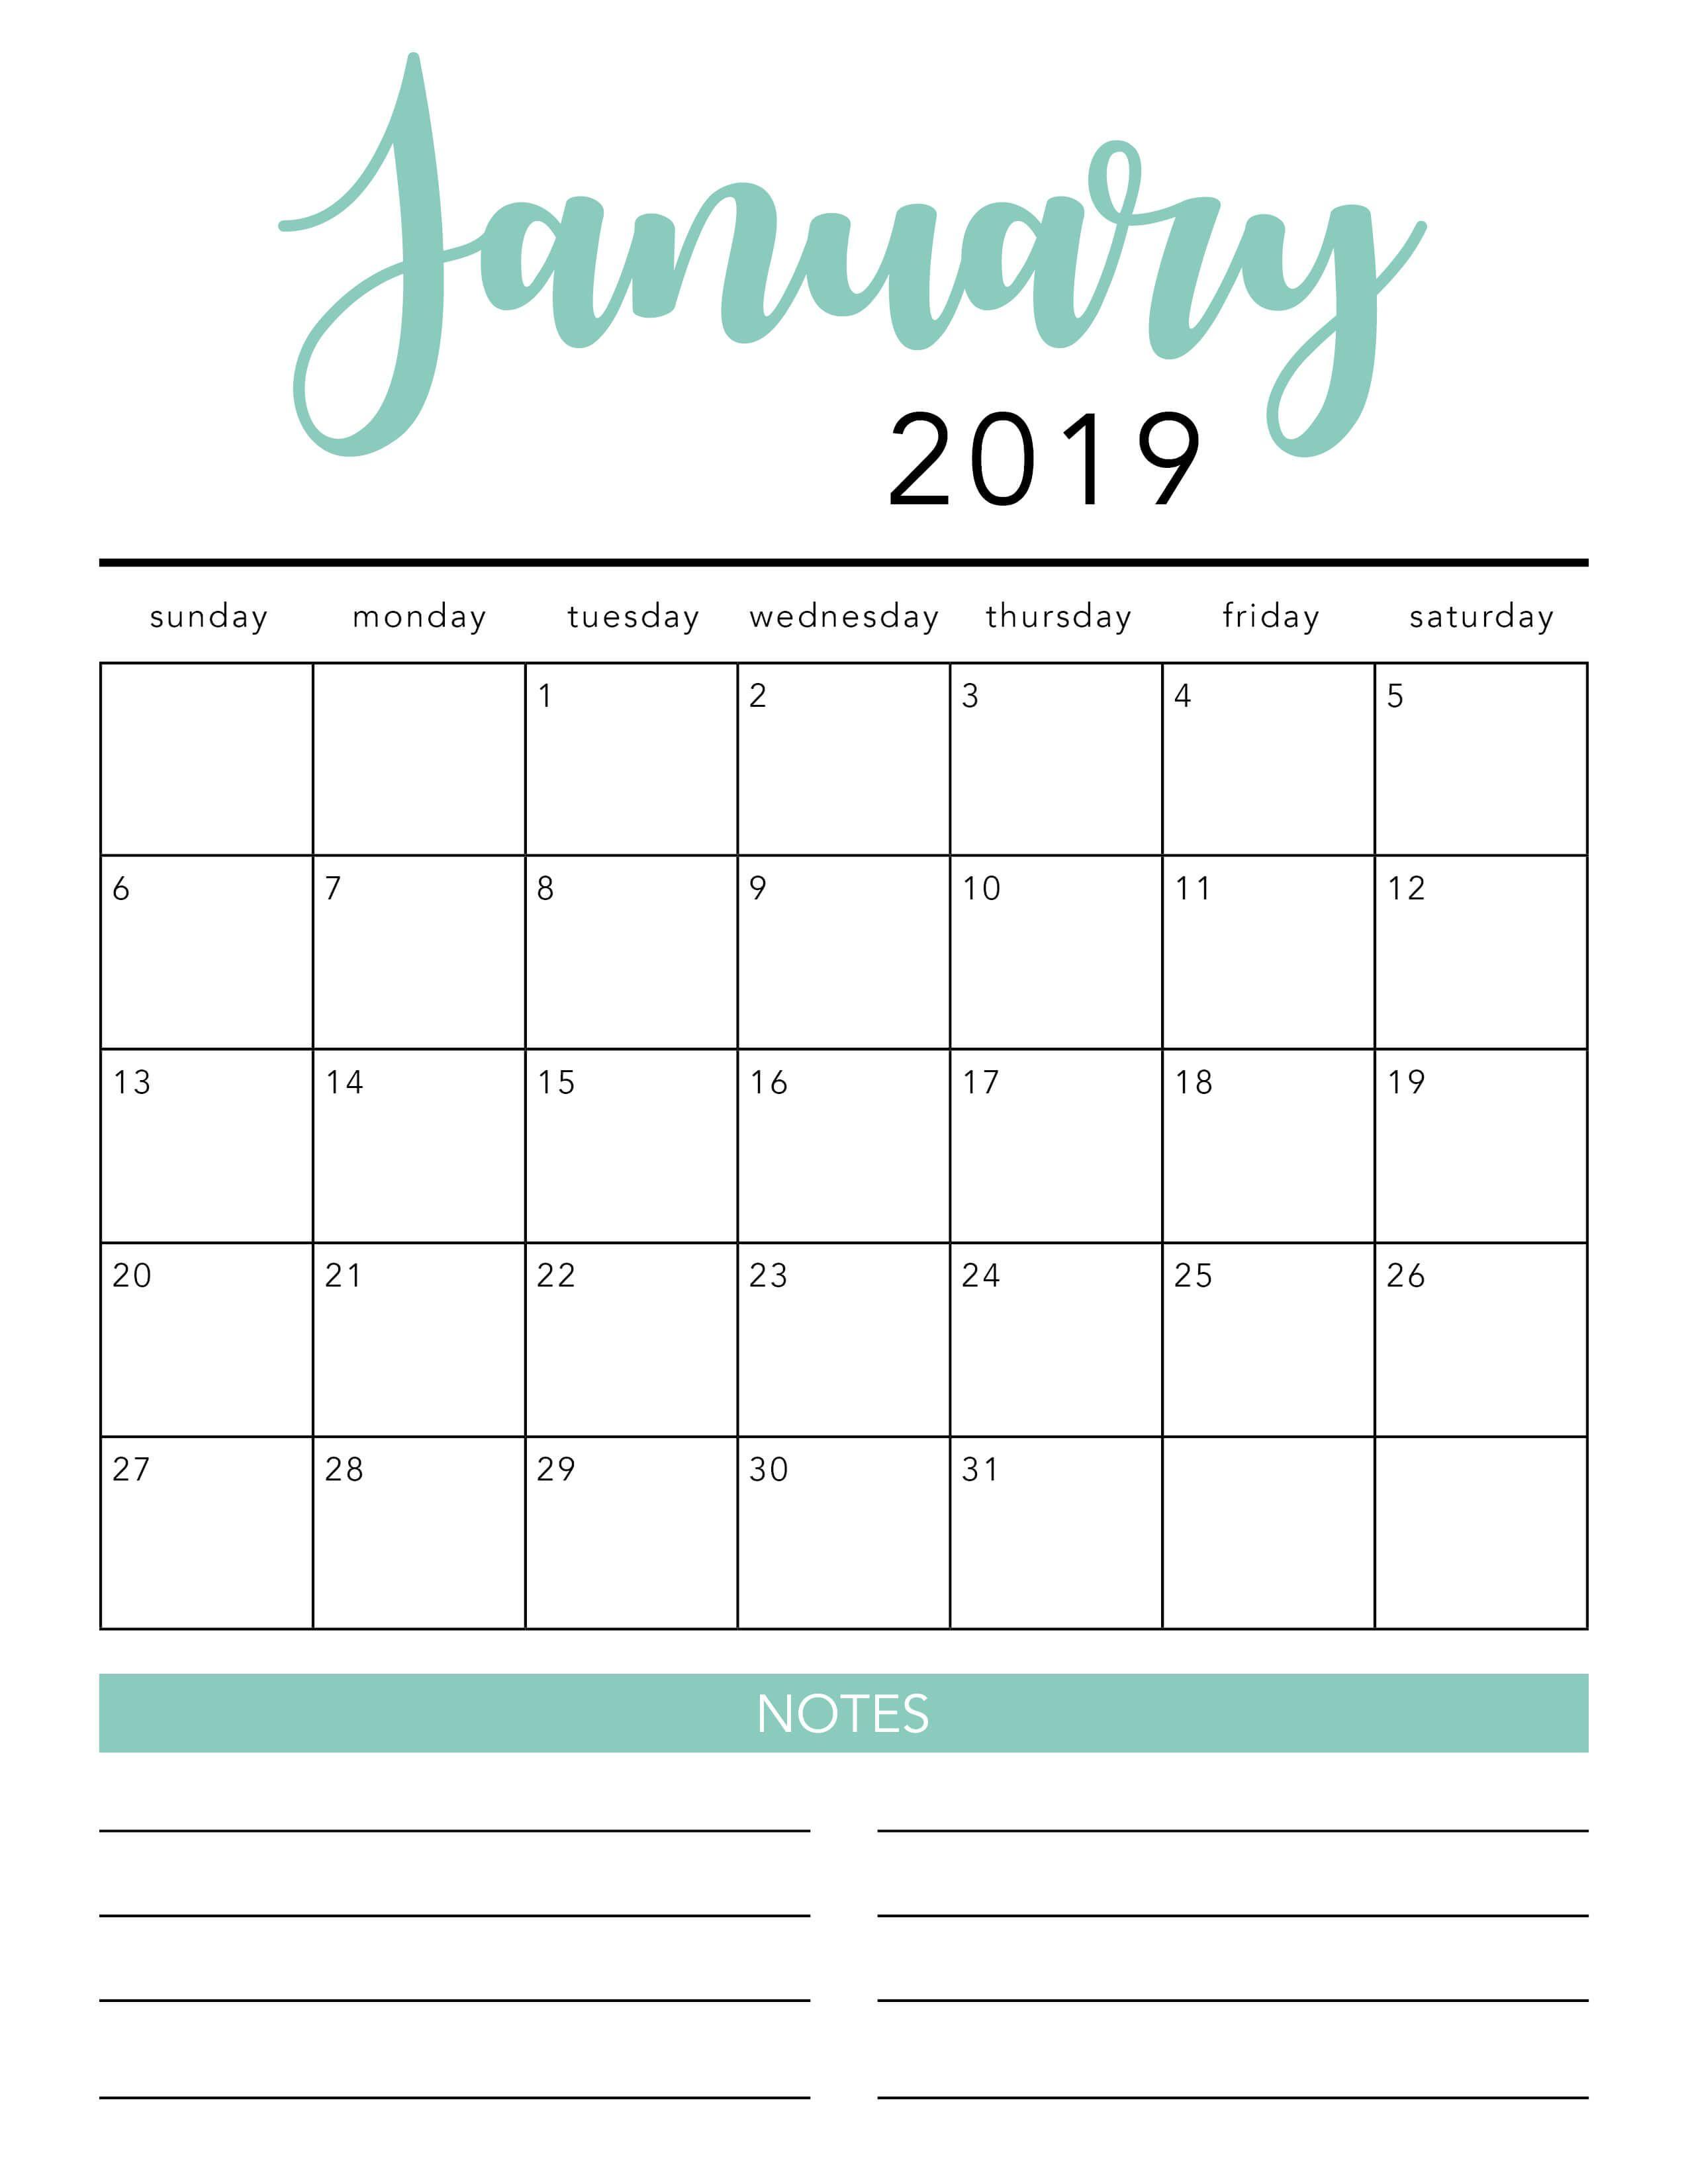 Calendar Free Template - Wpa.wpart.co